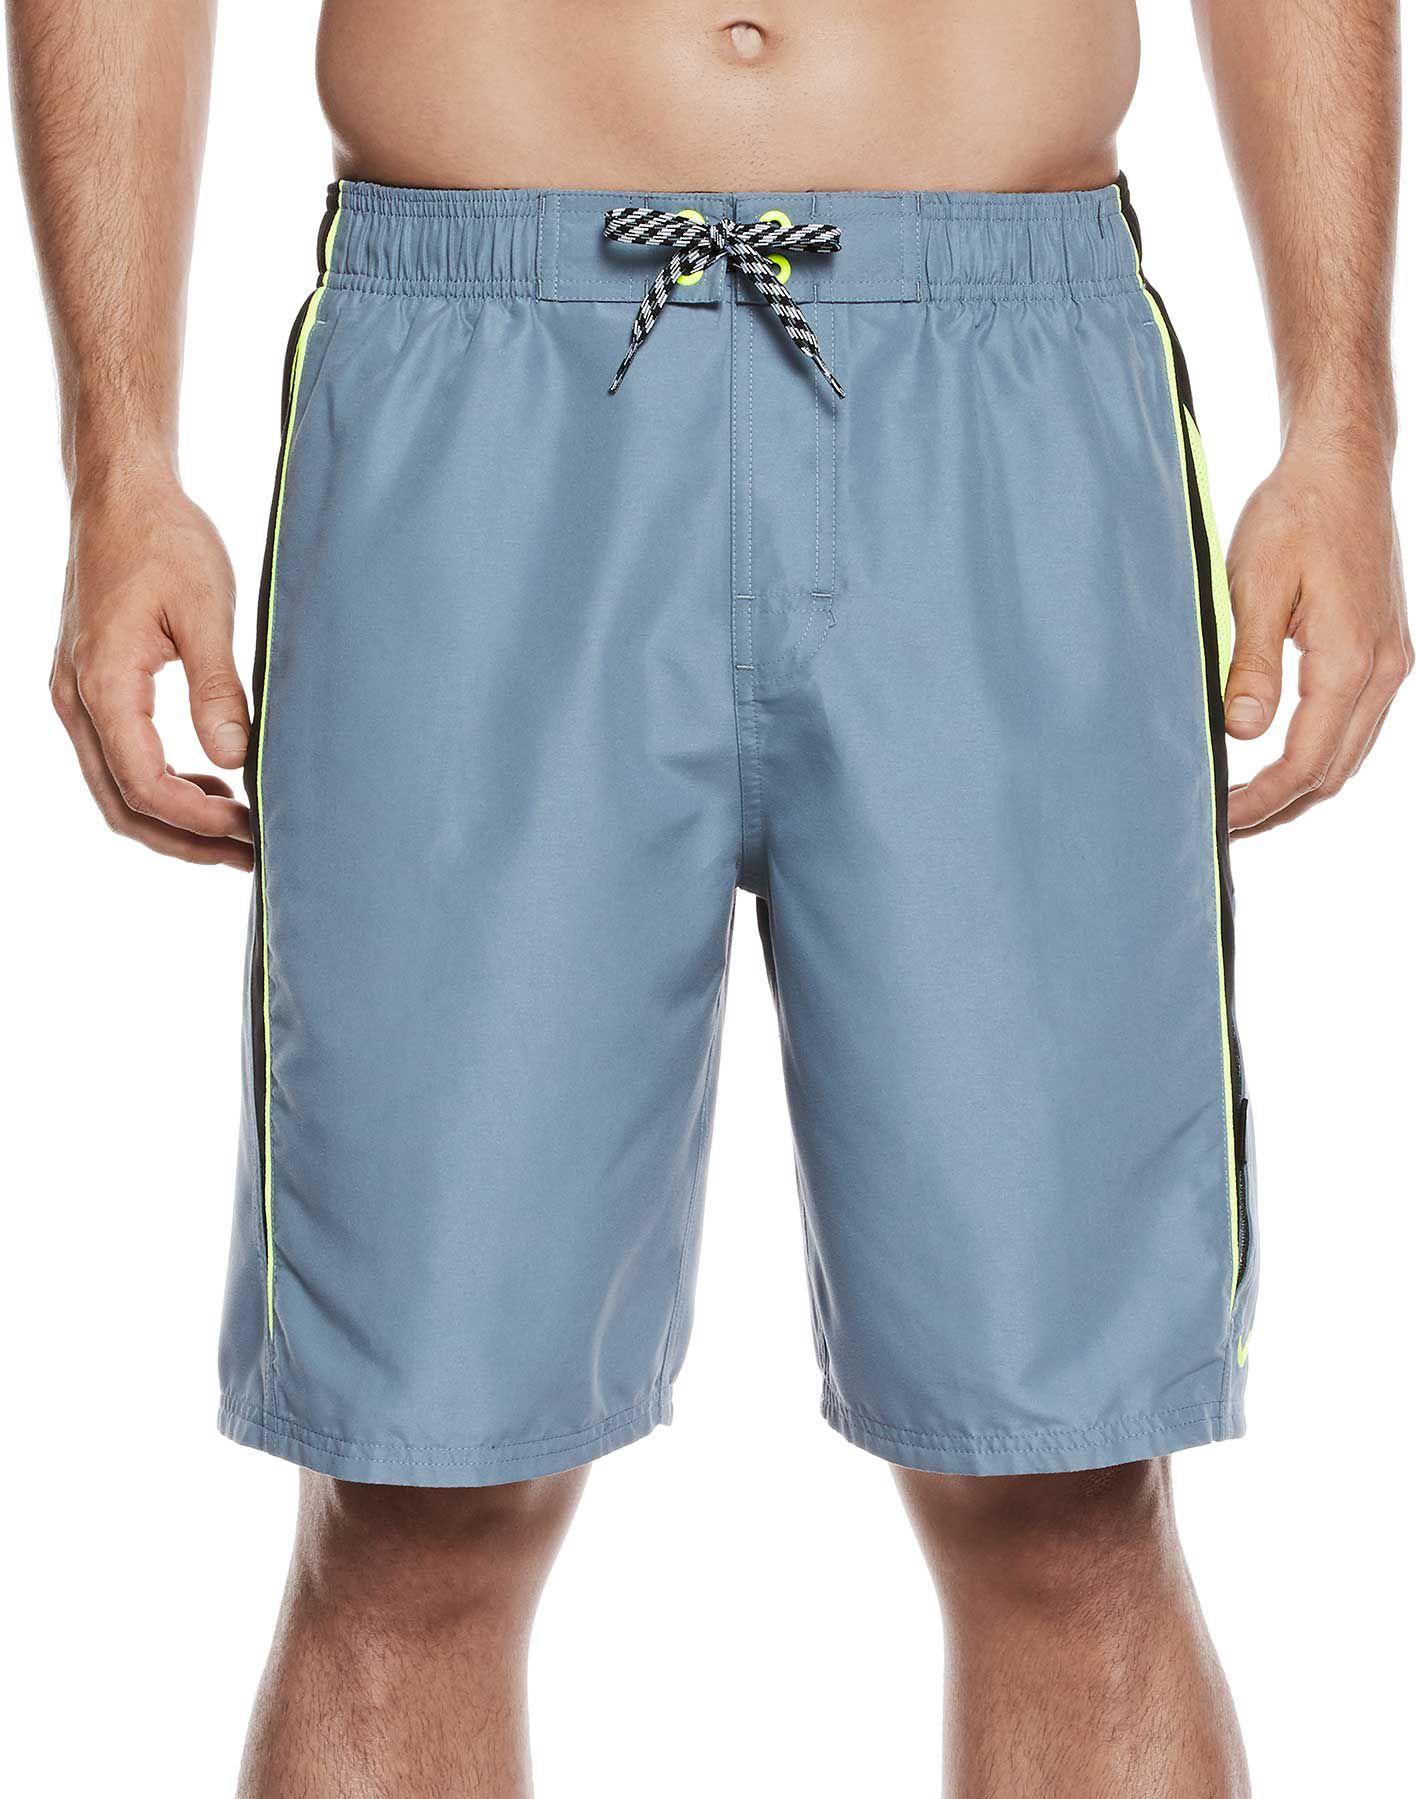 nike shorts mens clearance ,jordan shoes